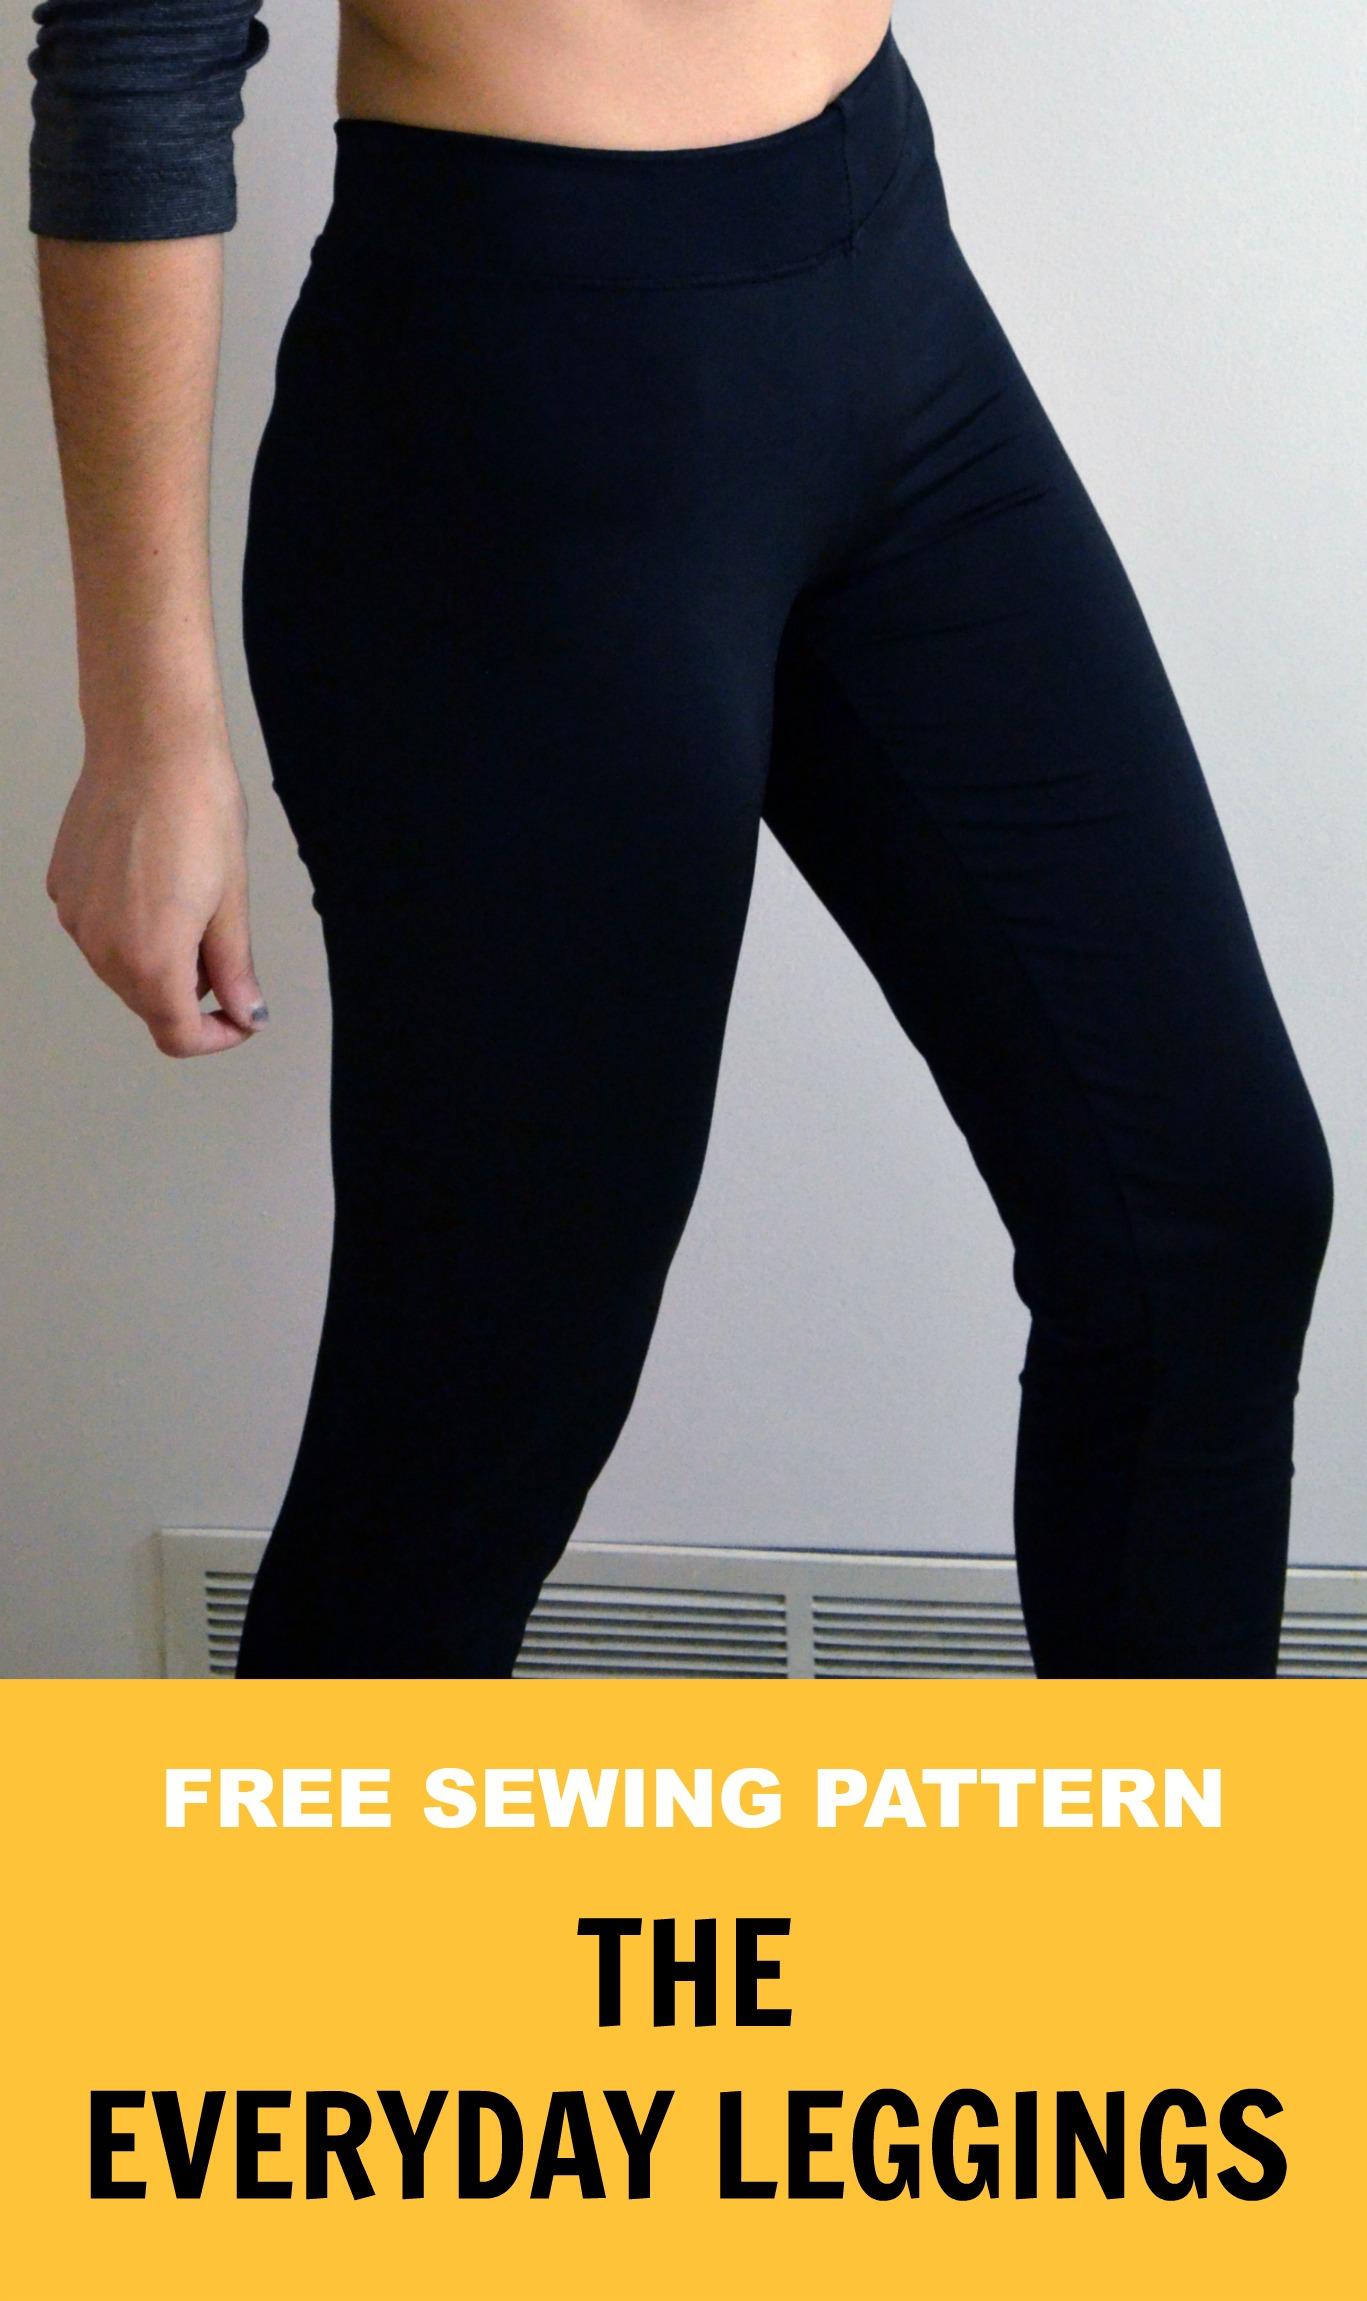 Leggings Sewing Pattern : leggings, sewing, pattern, SEWING, PATTERN:, Everyday, Leggings, Cutting, Floor:, Printable, Sewing, Patterns, Tutorials, Women